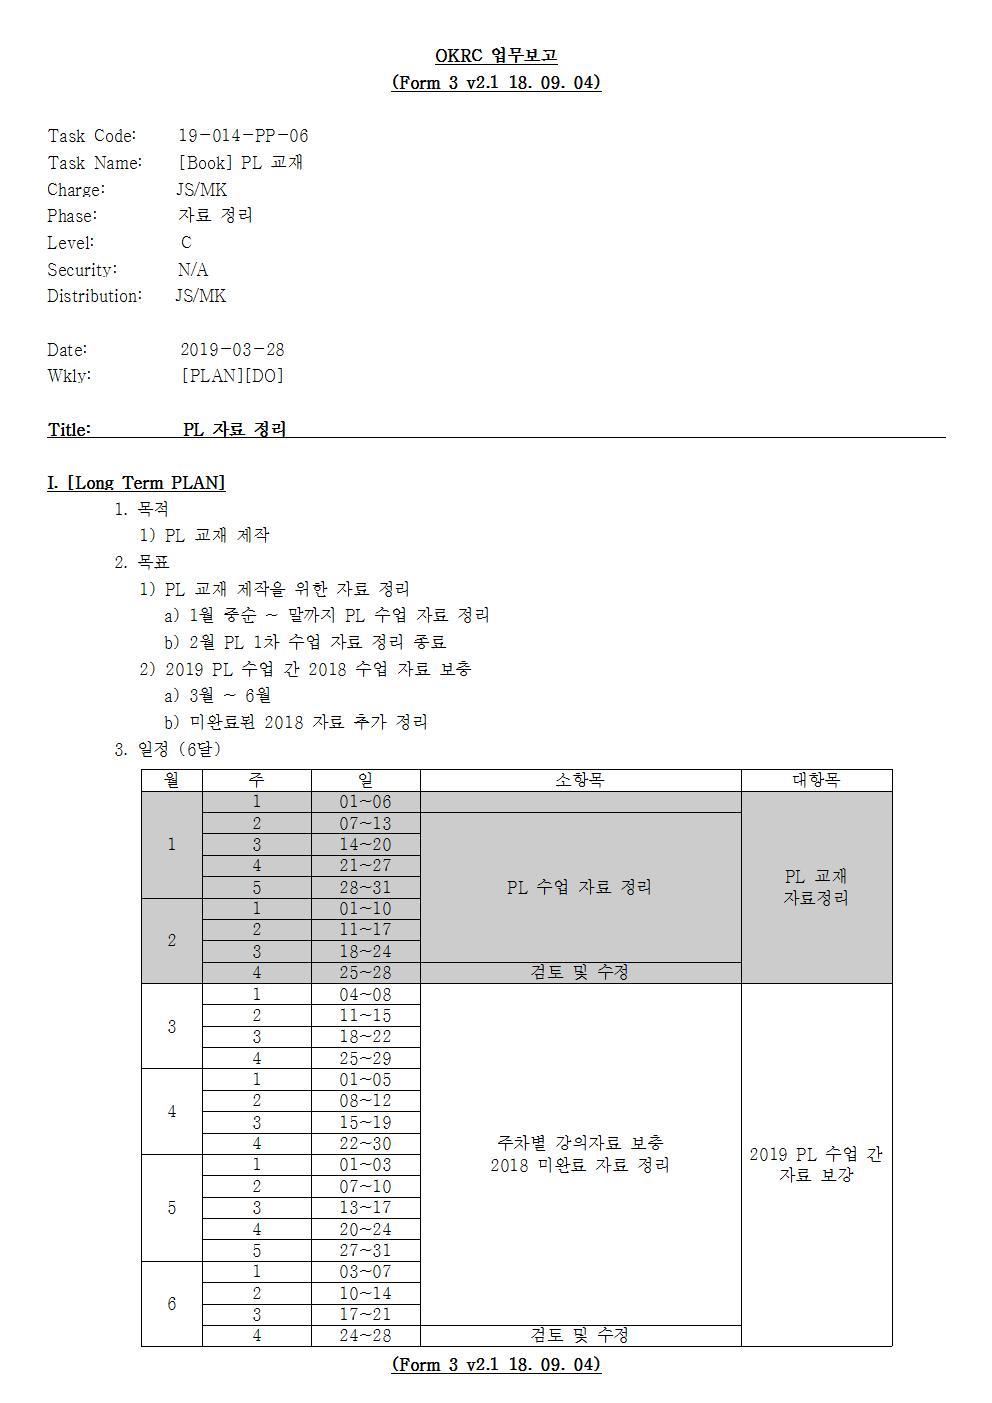 D-[19-014-PP-06]-[Book-PL]-[2019-03-29][JS]001.jpg